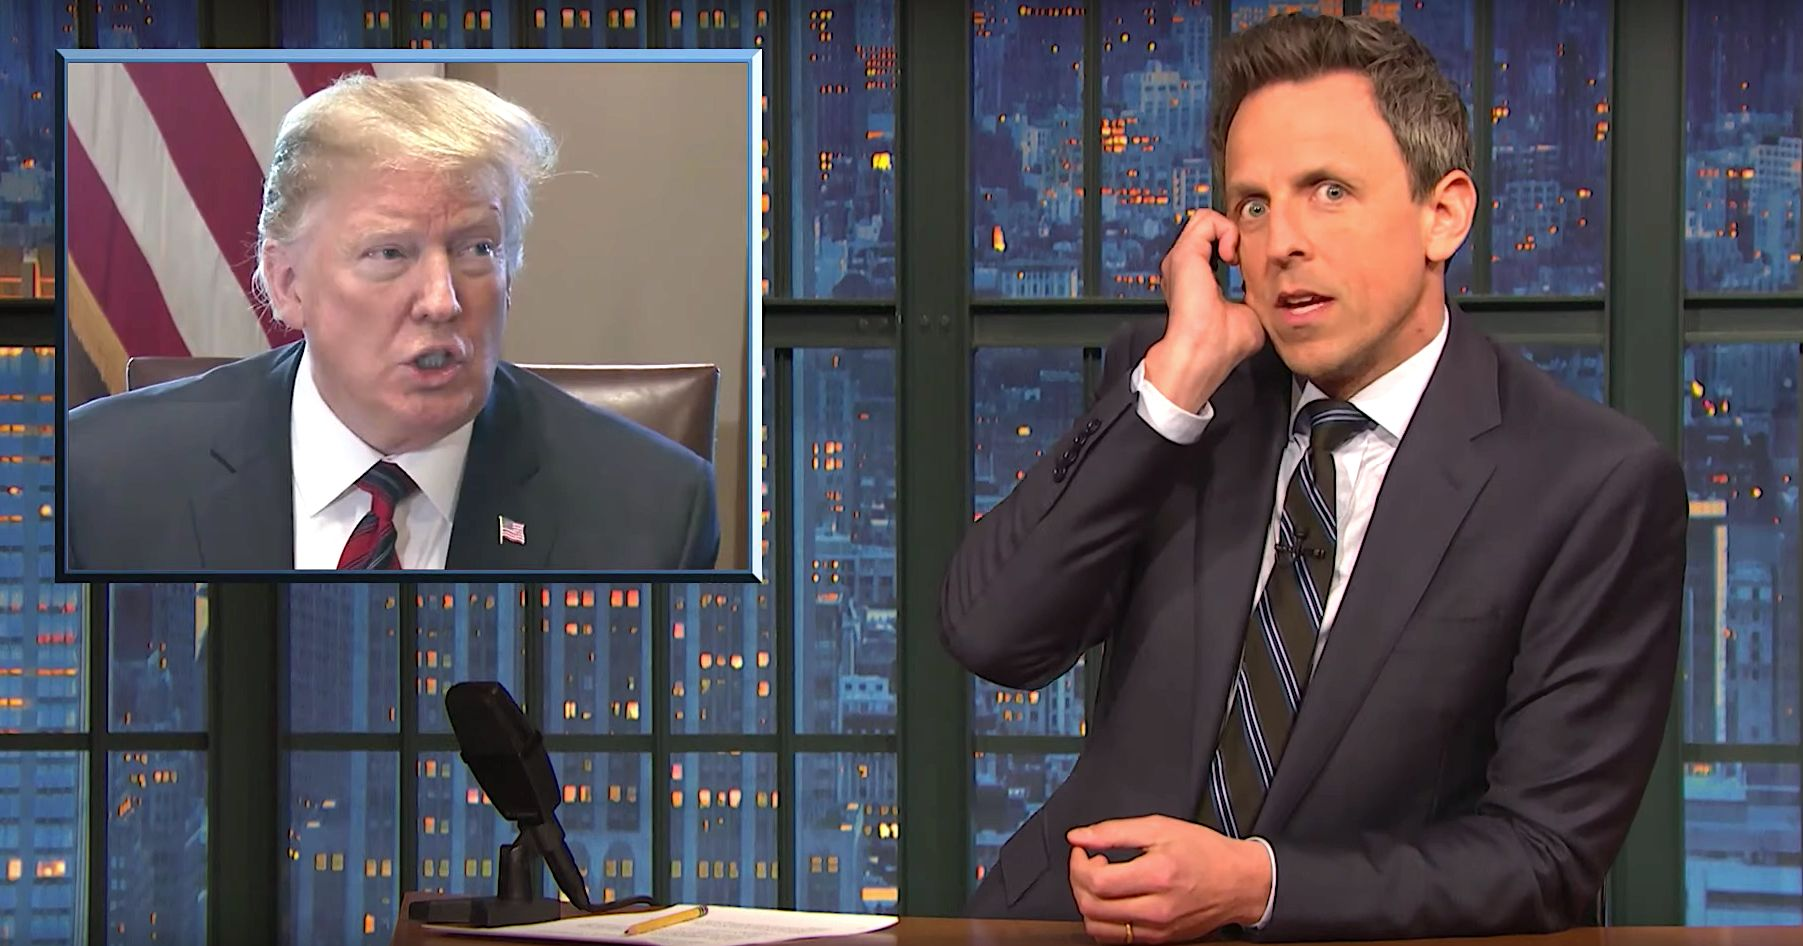 Donald Trump and Seth Meyers